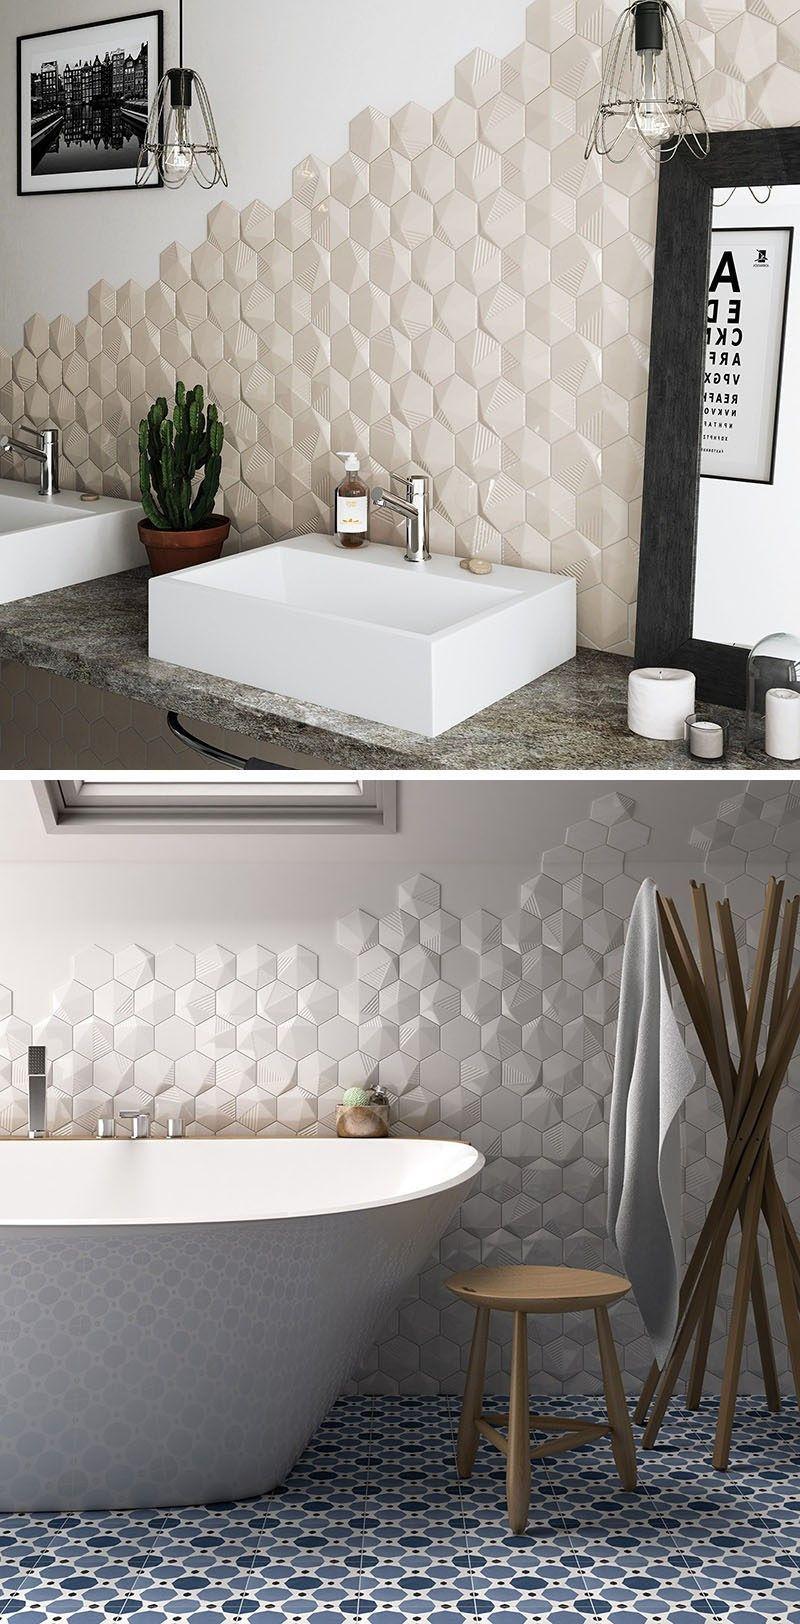 Badezimmer Fliesen Ideen Installieren 3d Fliesen Zu Hinzufugen Textur Ihr Bad Hexagonal Fliesen Mit Badezimmer Fliesen Ideen 3d Fliesen Badezimmer Fliesen